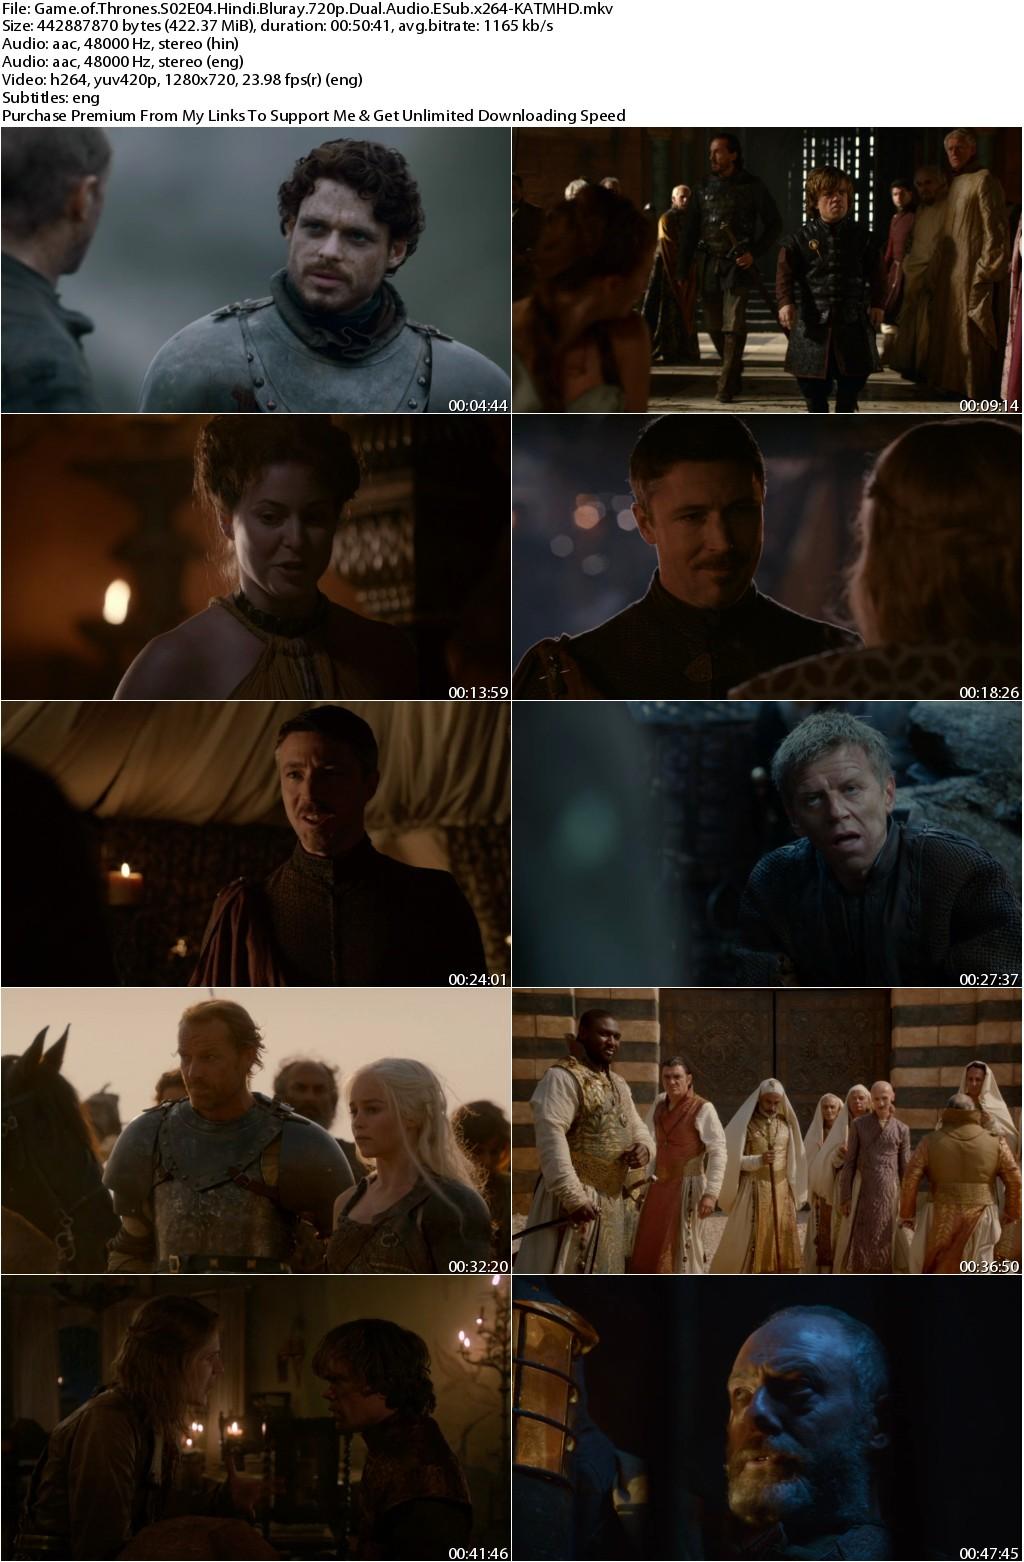 Game of Thrones S02E04 720p Bluray Dual Audio Eng Hindi ESub x264-KATMHD